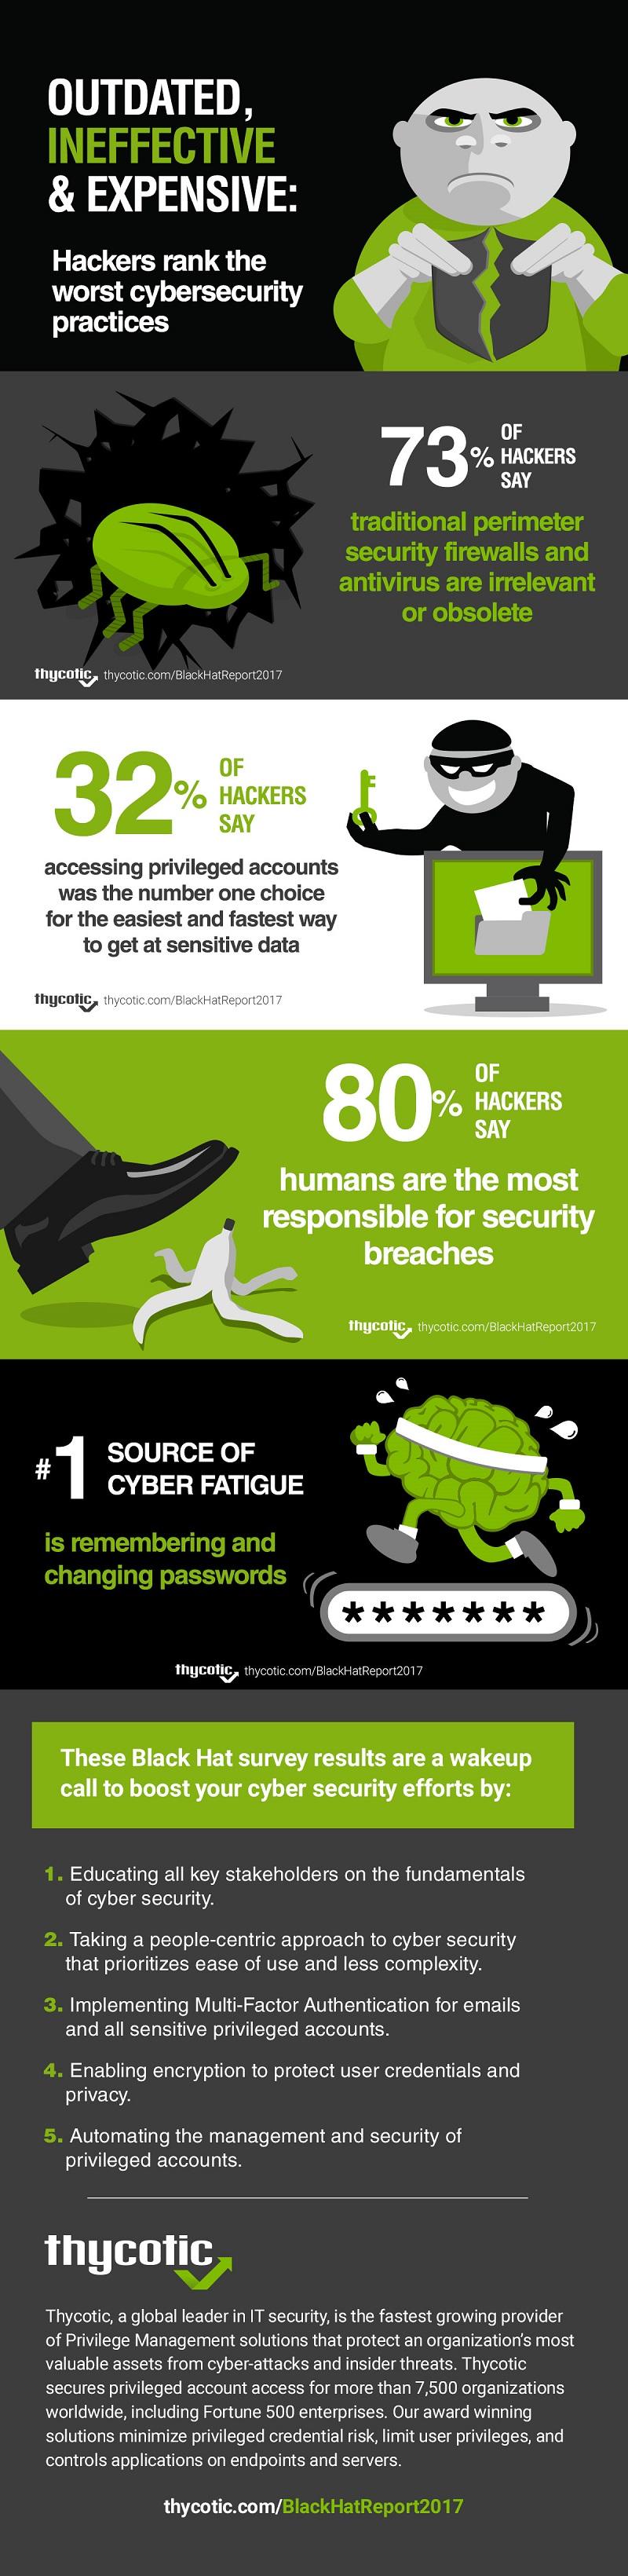 Hackers Rank the Worst Cybersecurity Practices